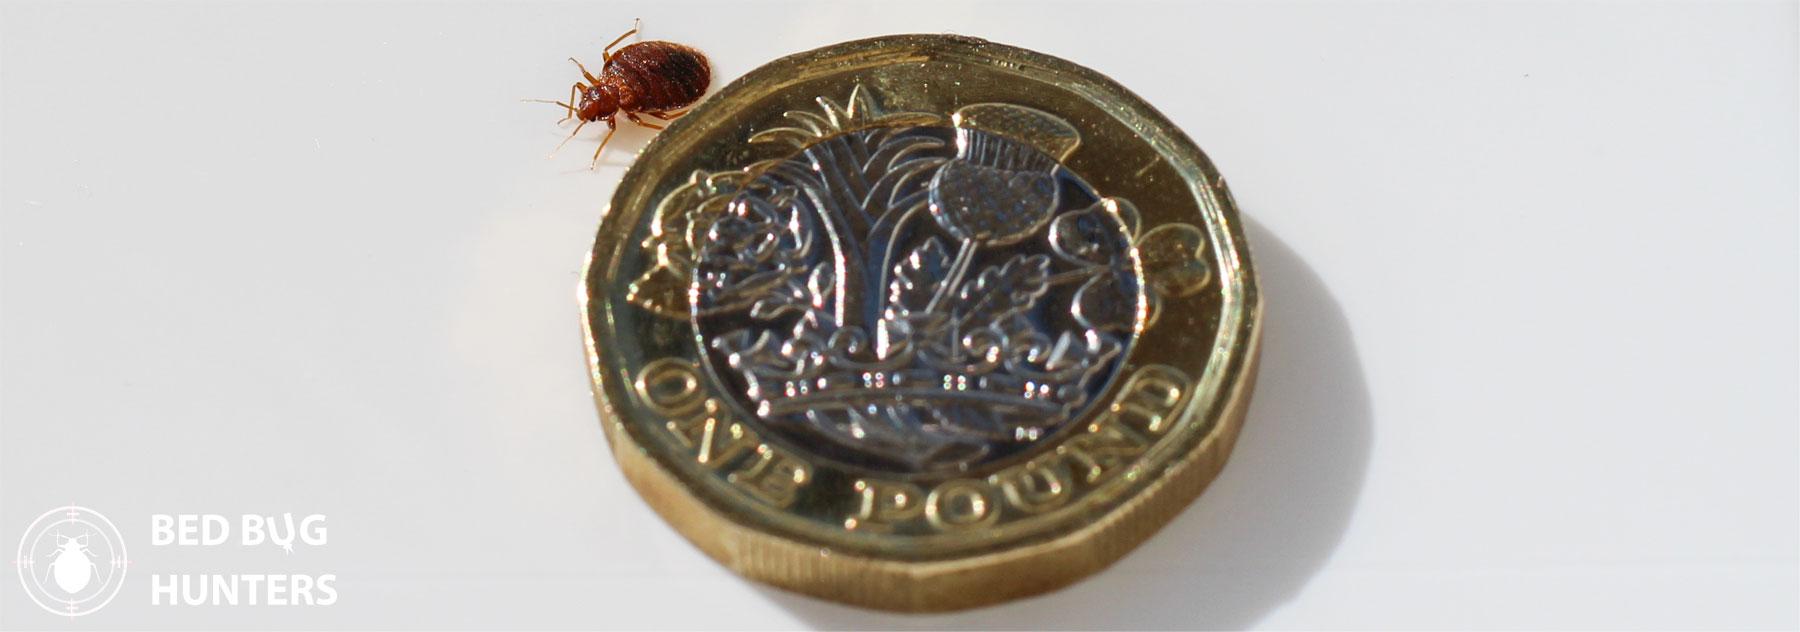 bed-bug-macro-pound-coin